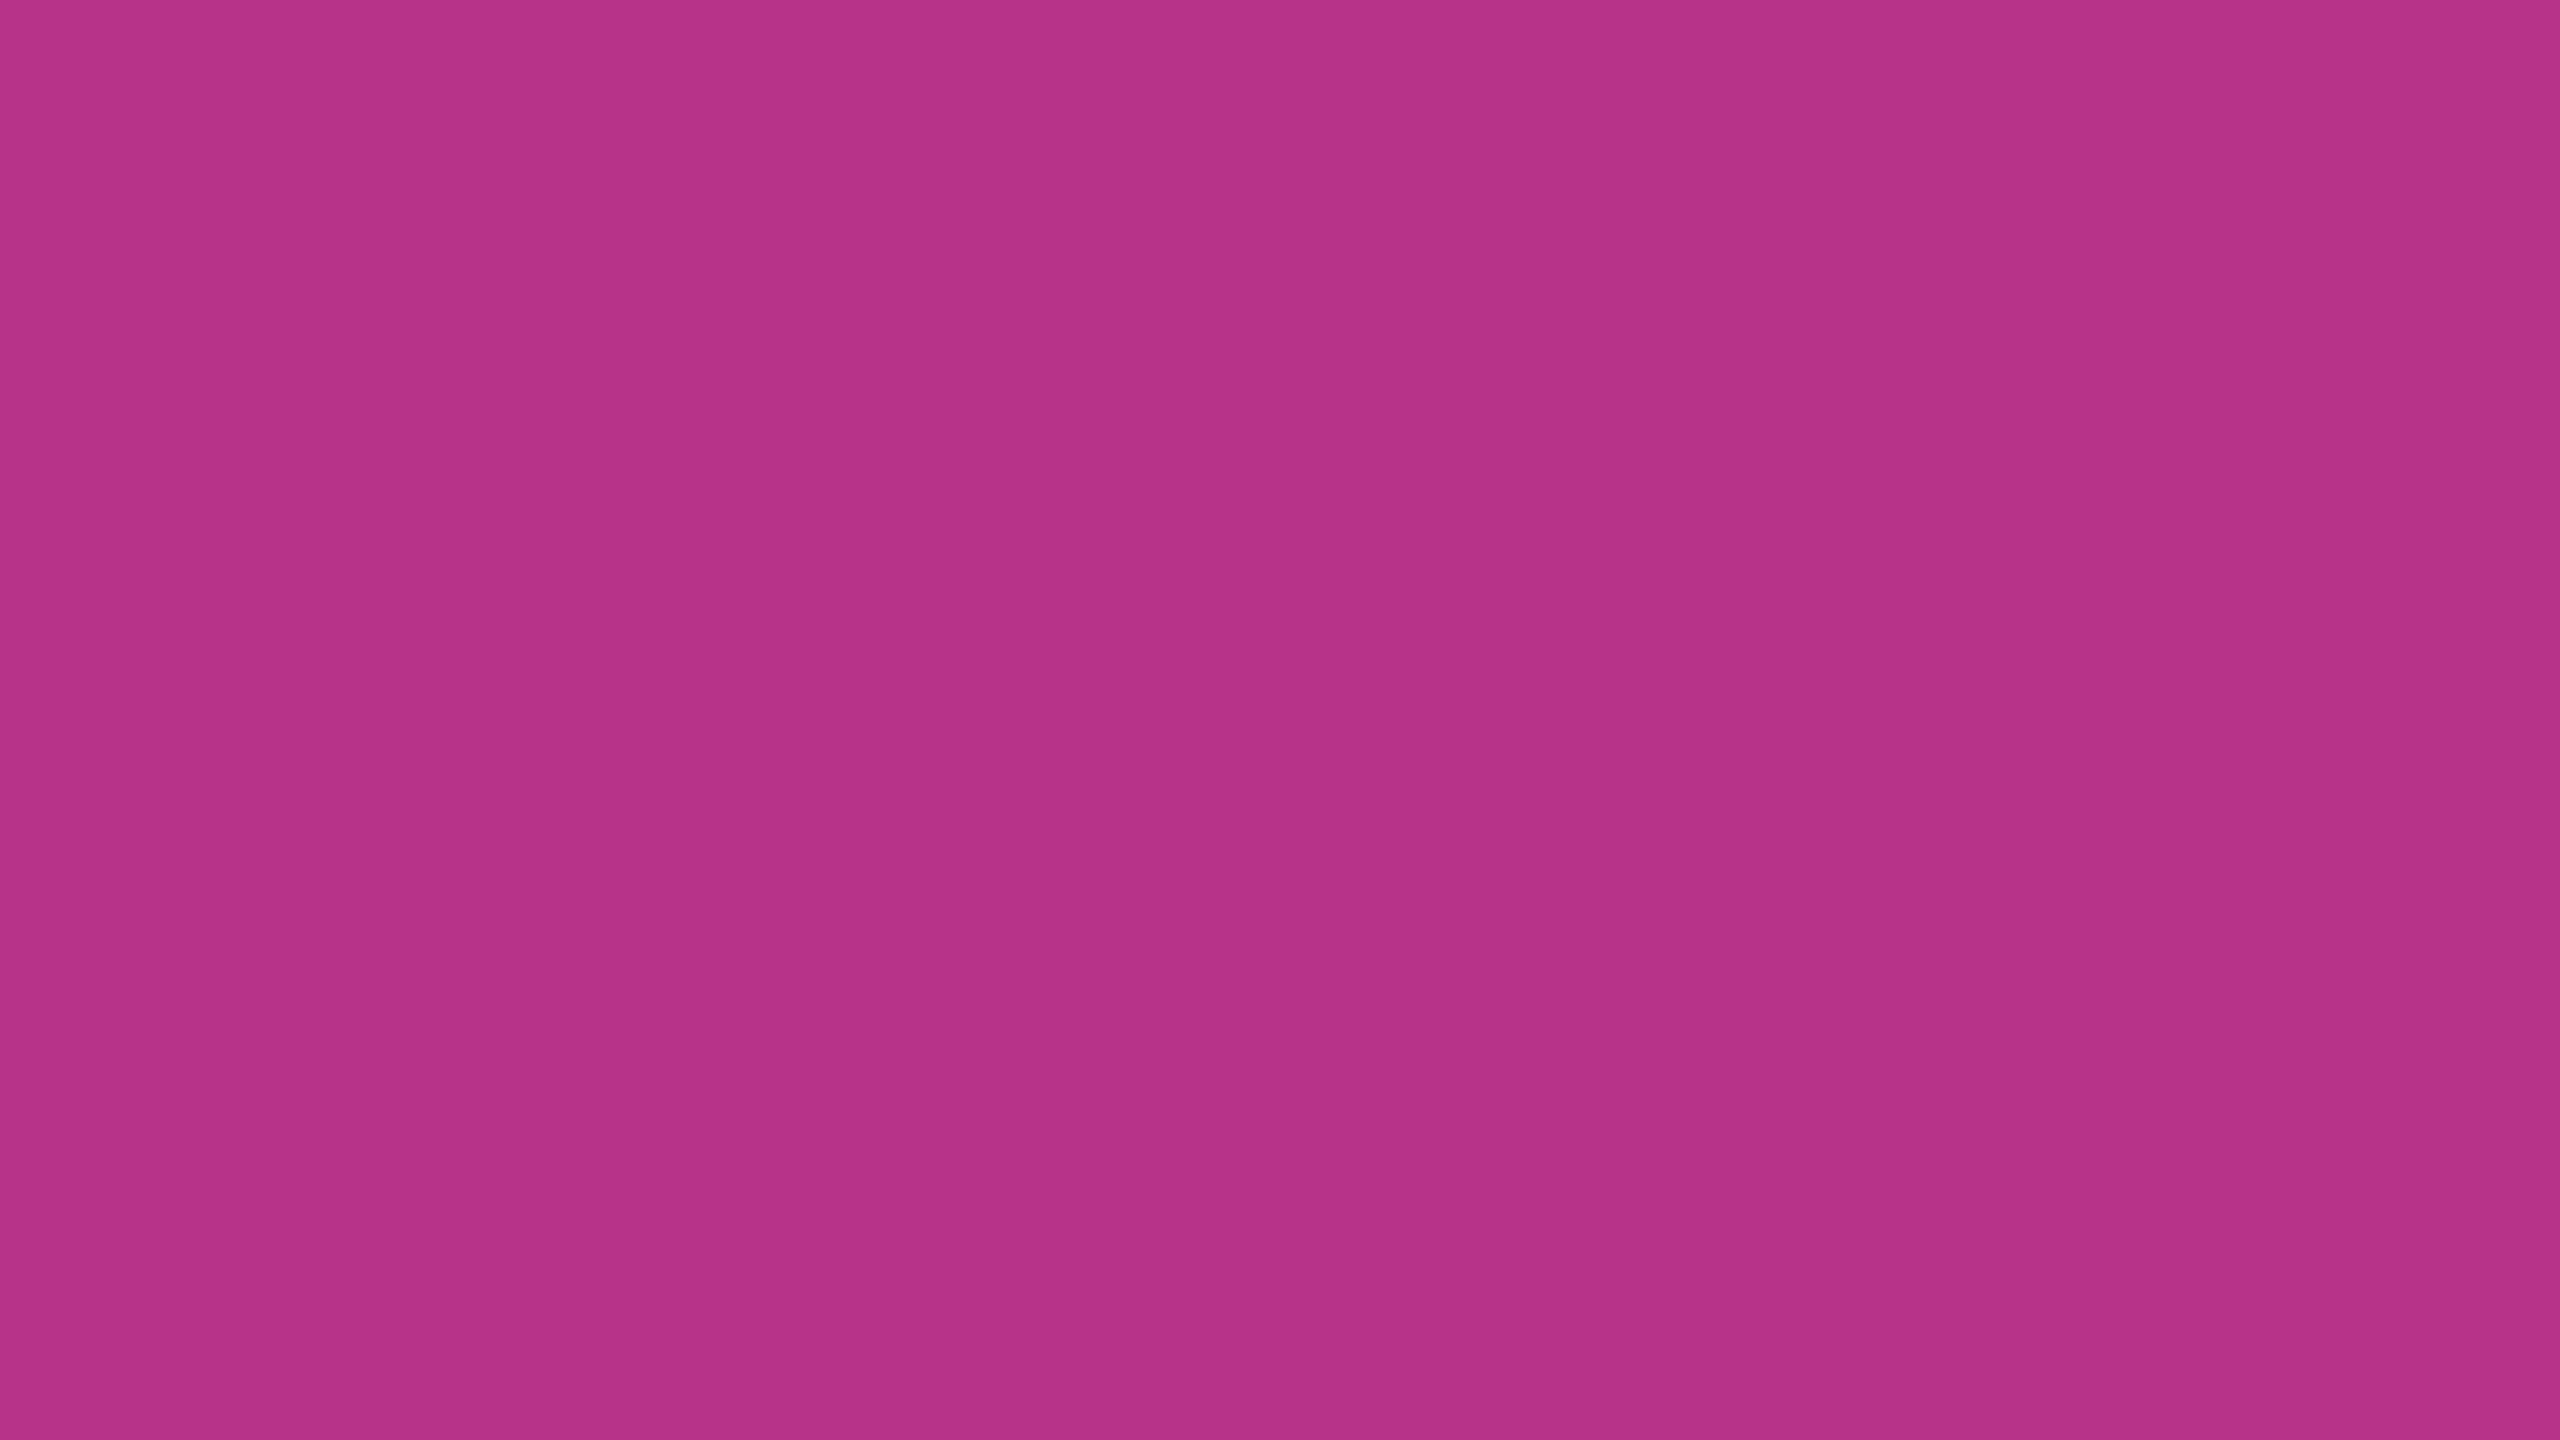 2560x1440 Fandango Solid Color Background